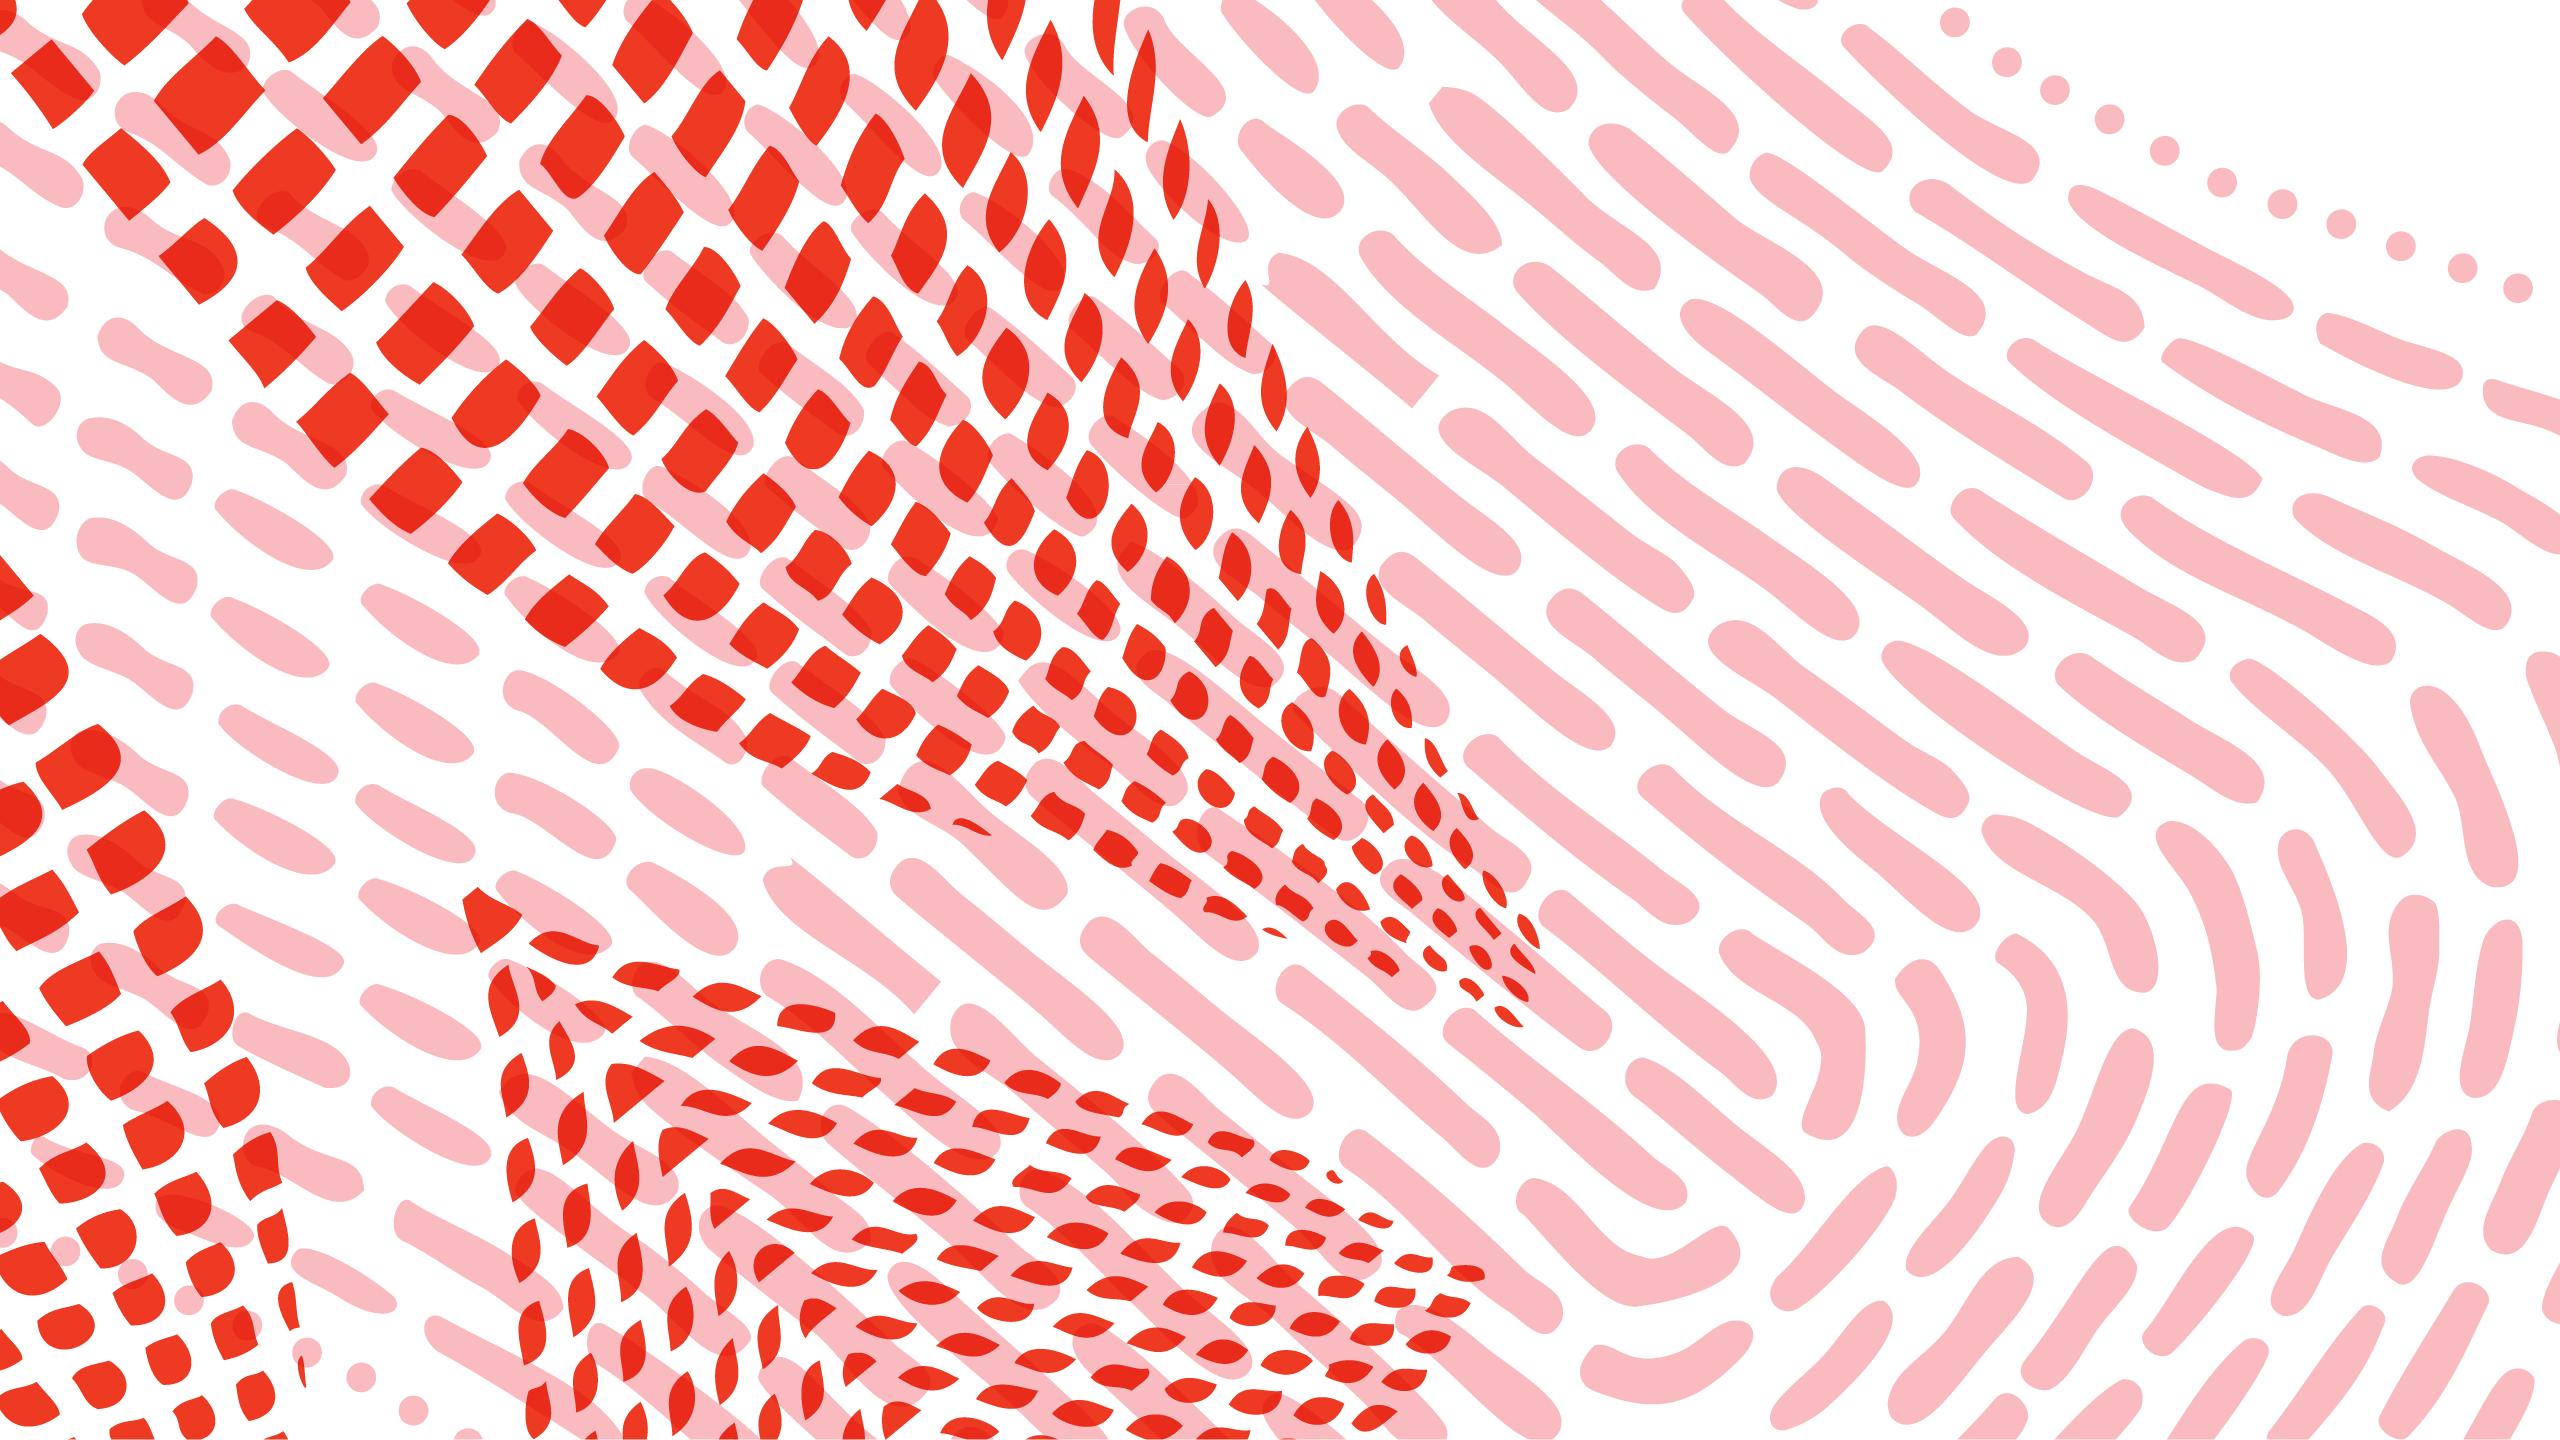 Herman Miller Neocon 2019 Design Pattern Cool Wallpaper